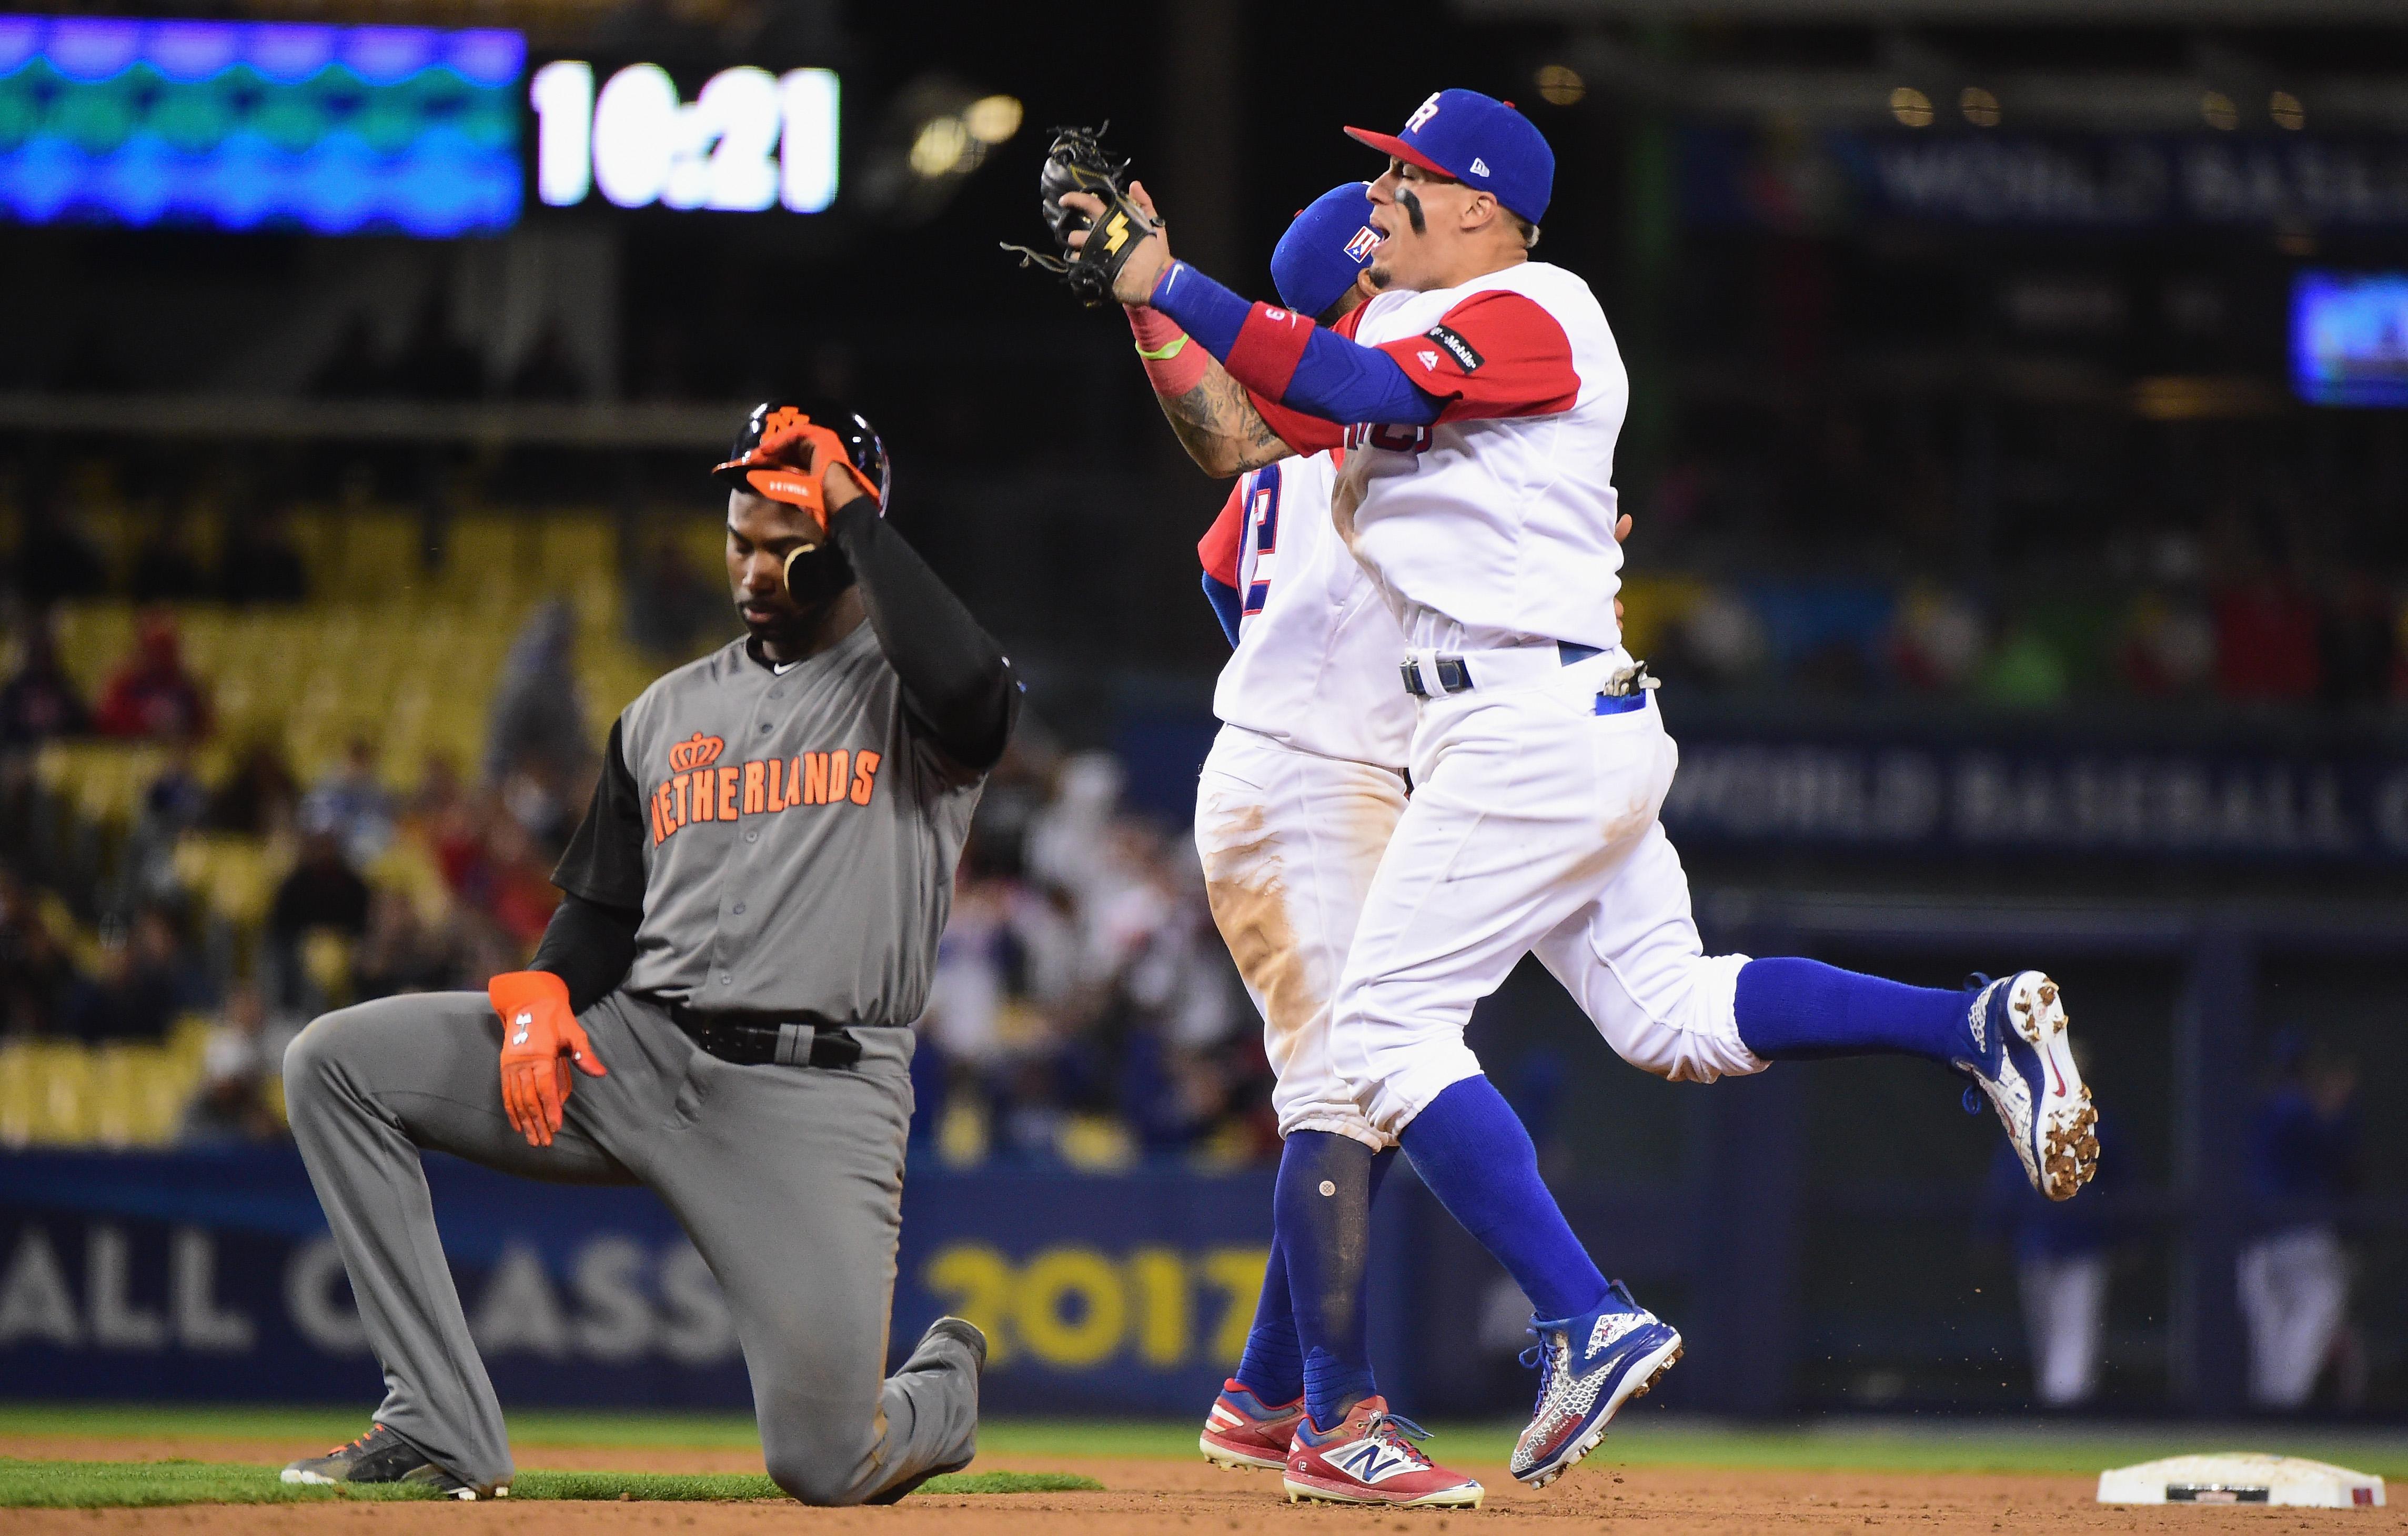 World Baseball Classic - Championship Round - Game 1 - Netherlands v Puerto Rico